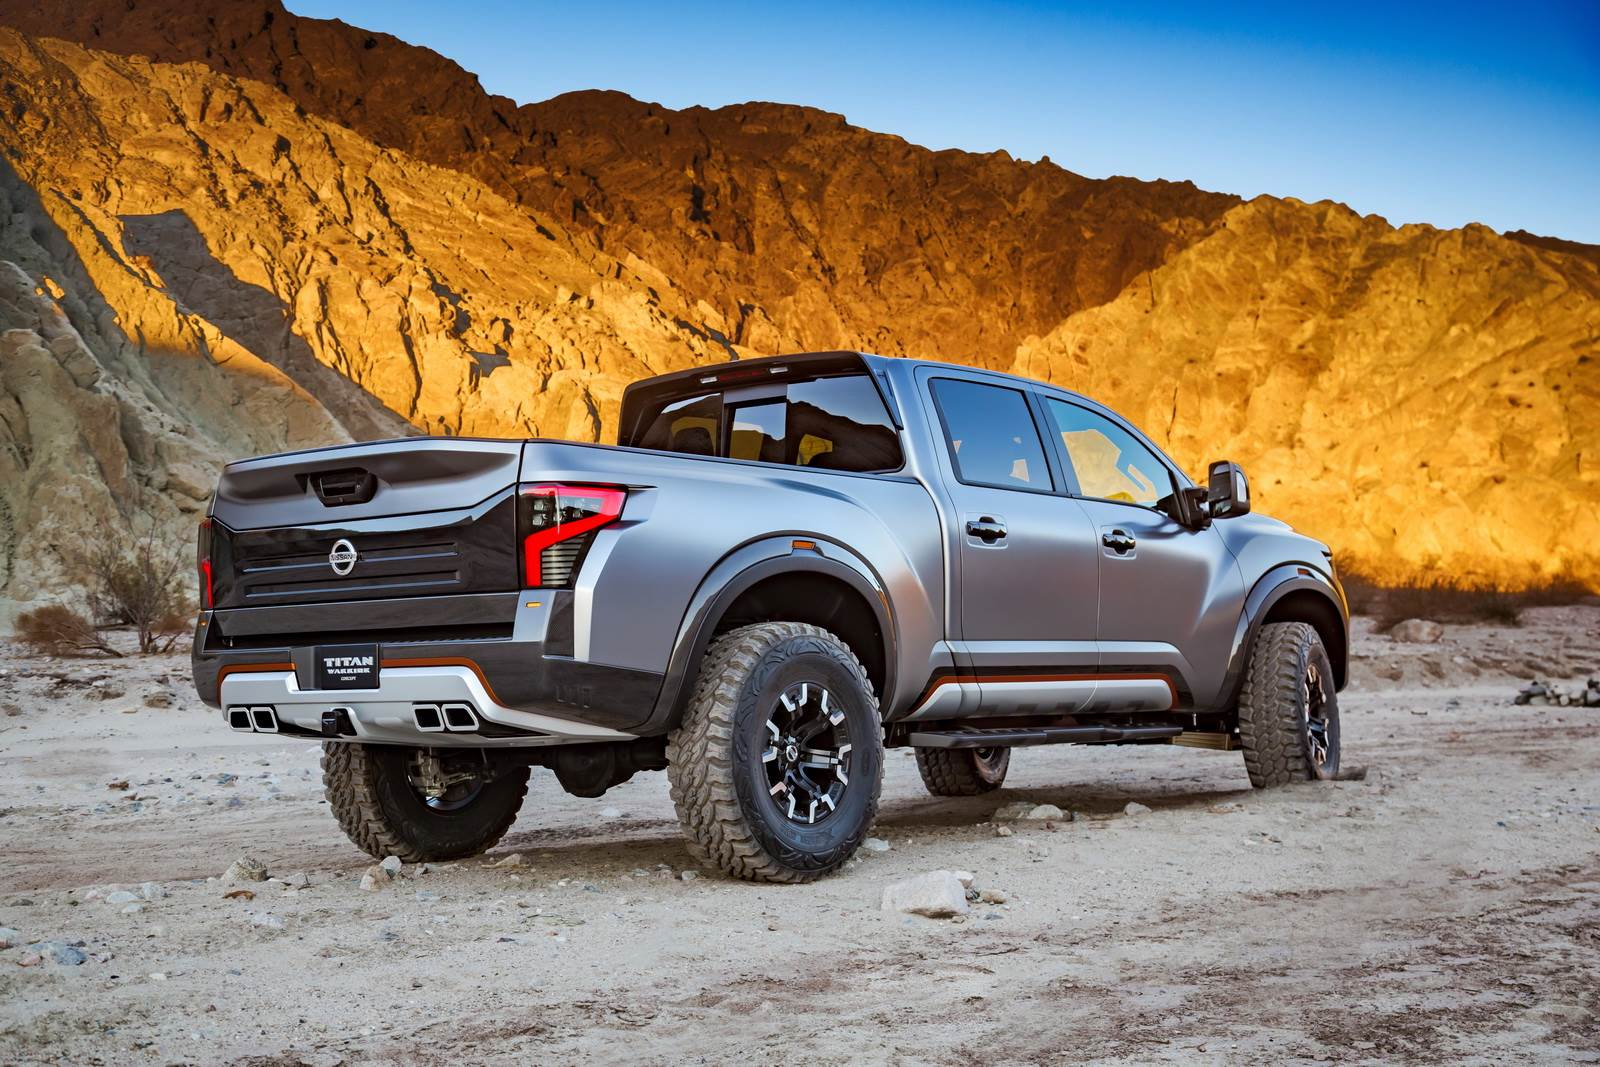 Nissan Titan Warrior Concept Photo Gallery Autocar India